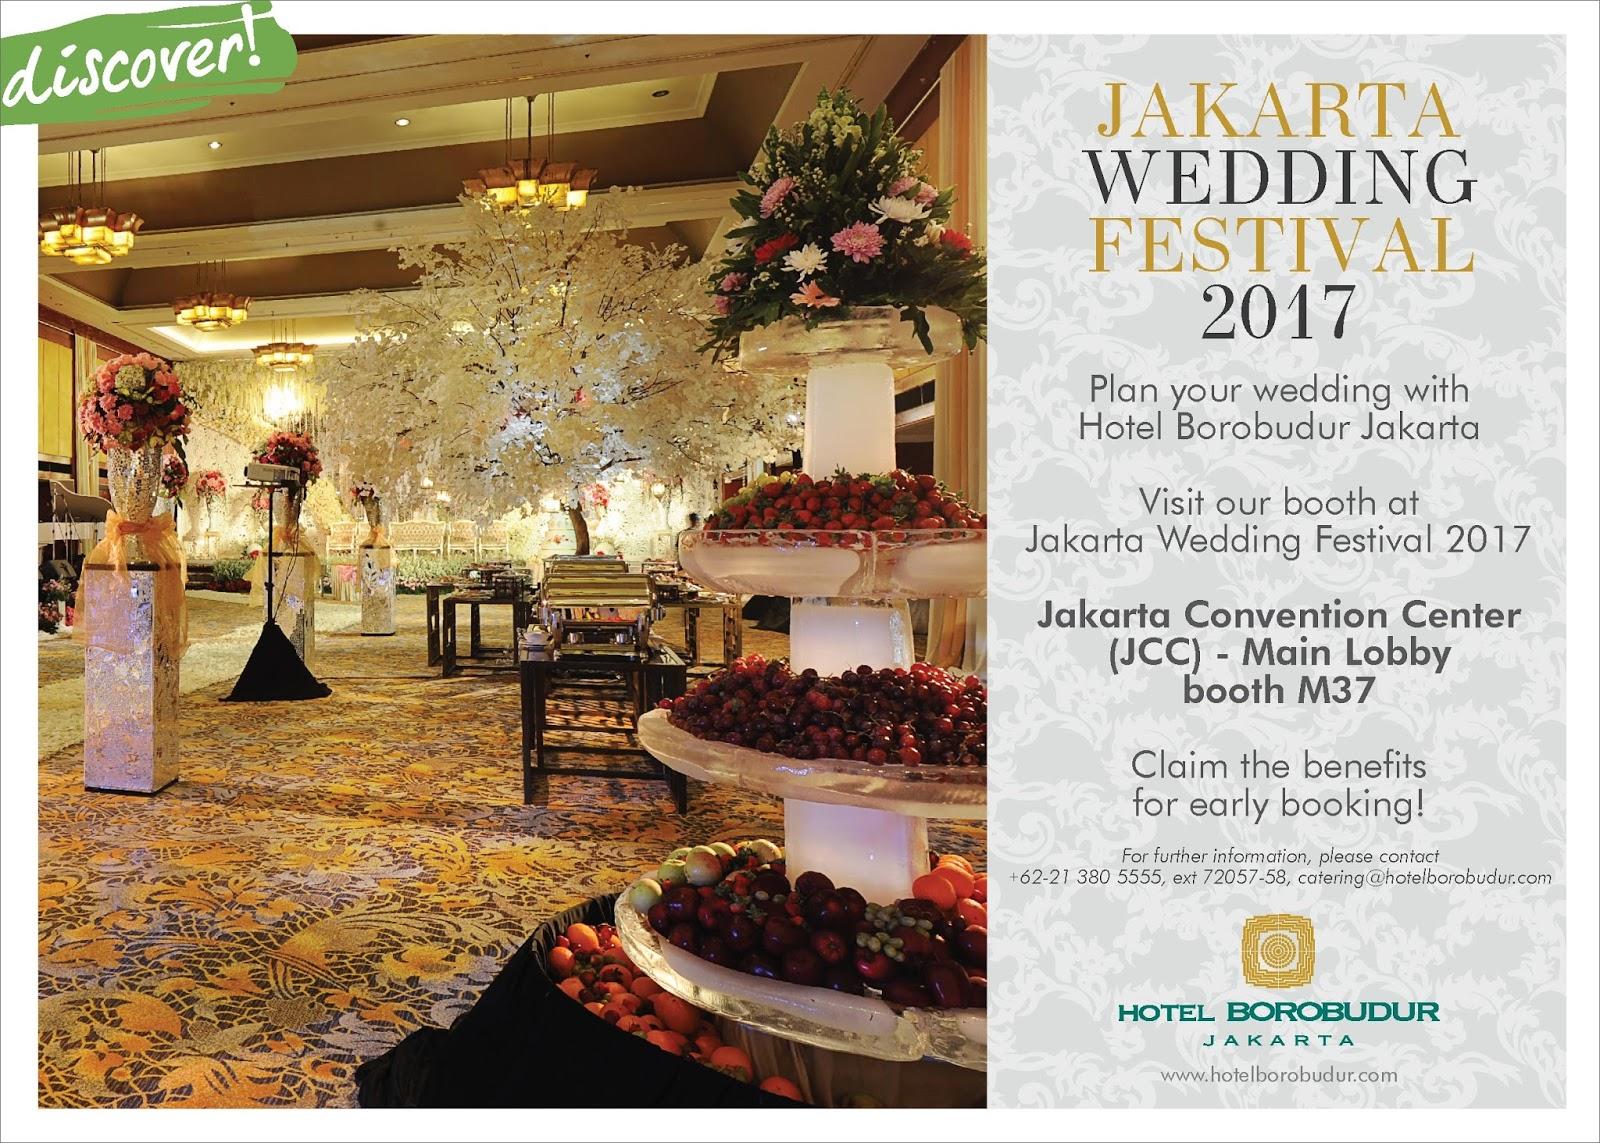 Jakarta Wedding Festival 2017